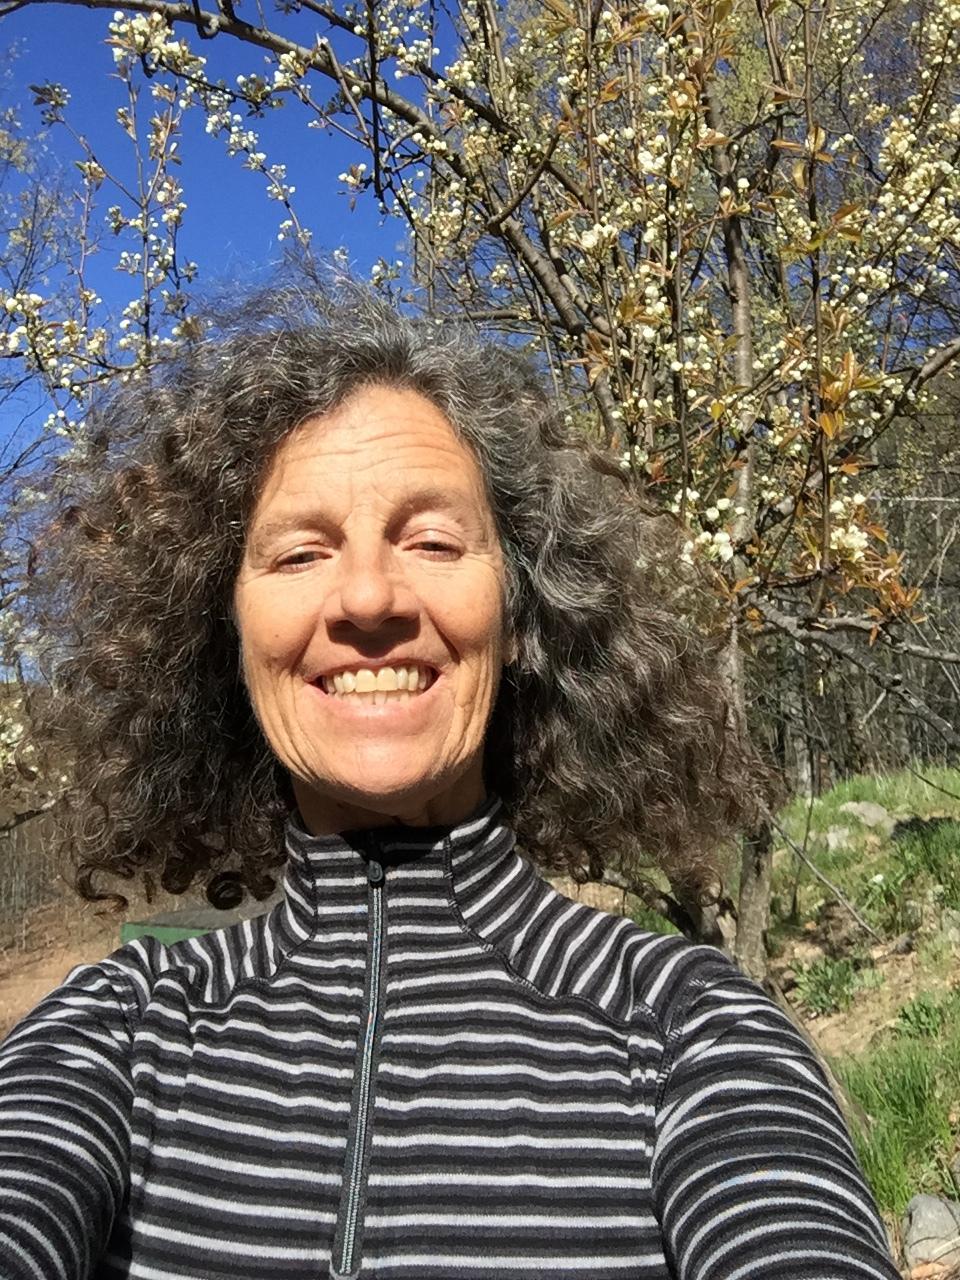 mary eschbach - A wild and crazy heartfelt activist.